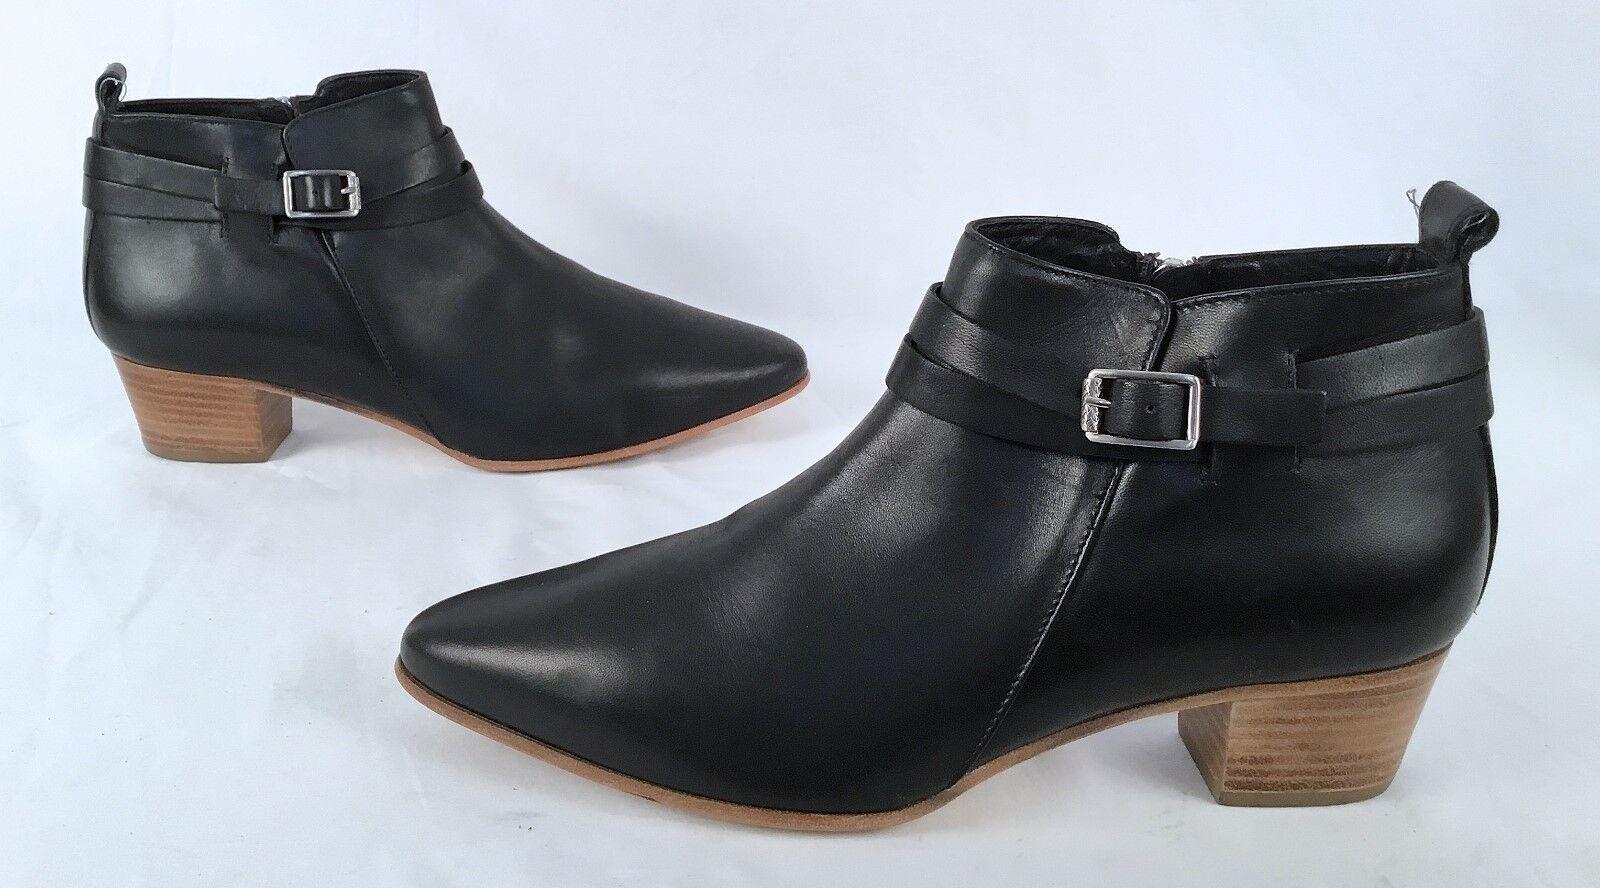 Soldes des Chaussures Qoe9wp1Basket Adidas Chaussures Femme